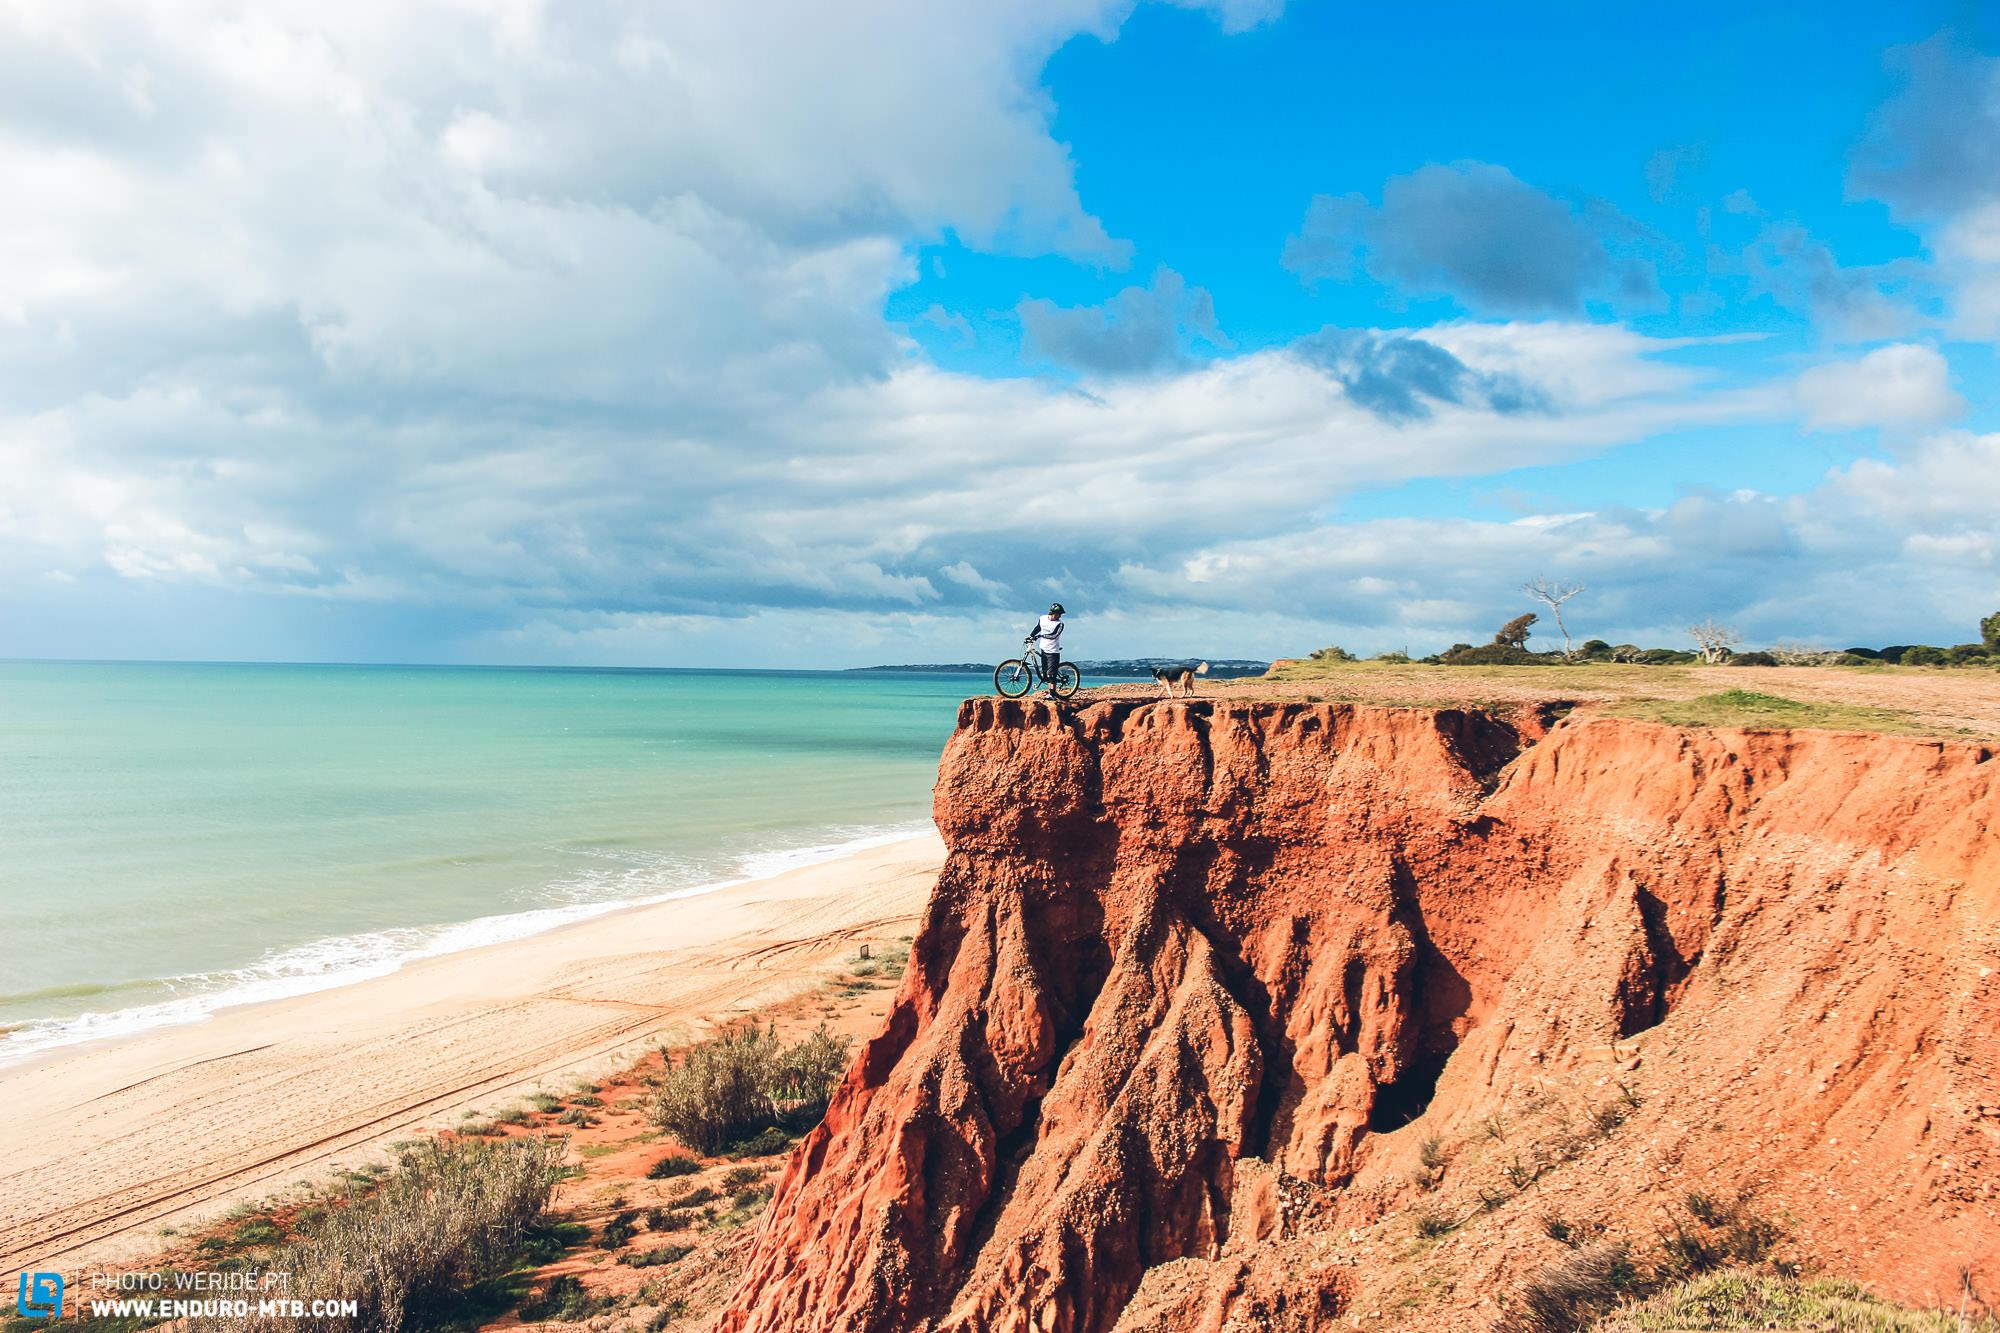 Travel-Story-Portugal-Algave-1.jpg